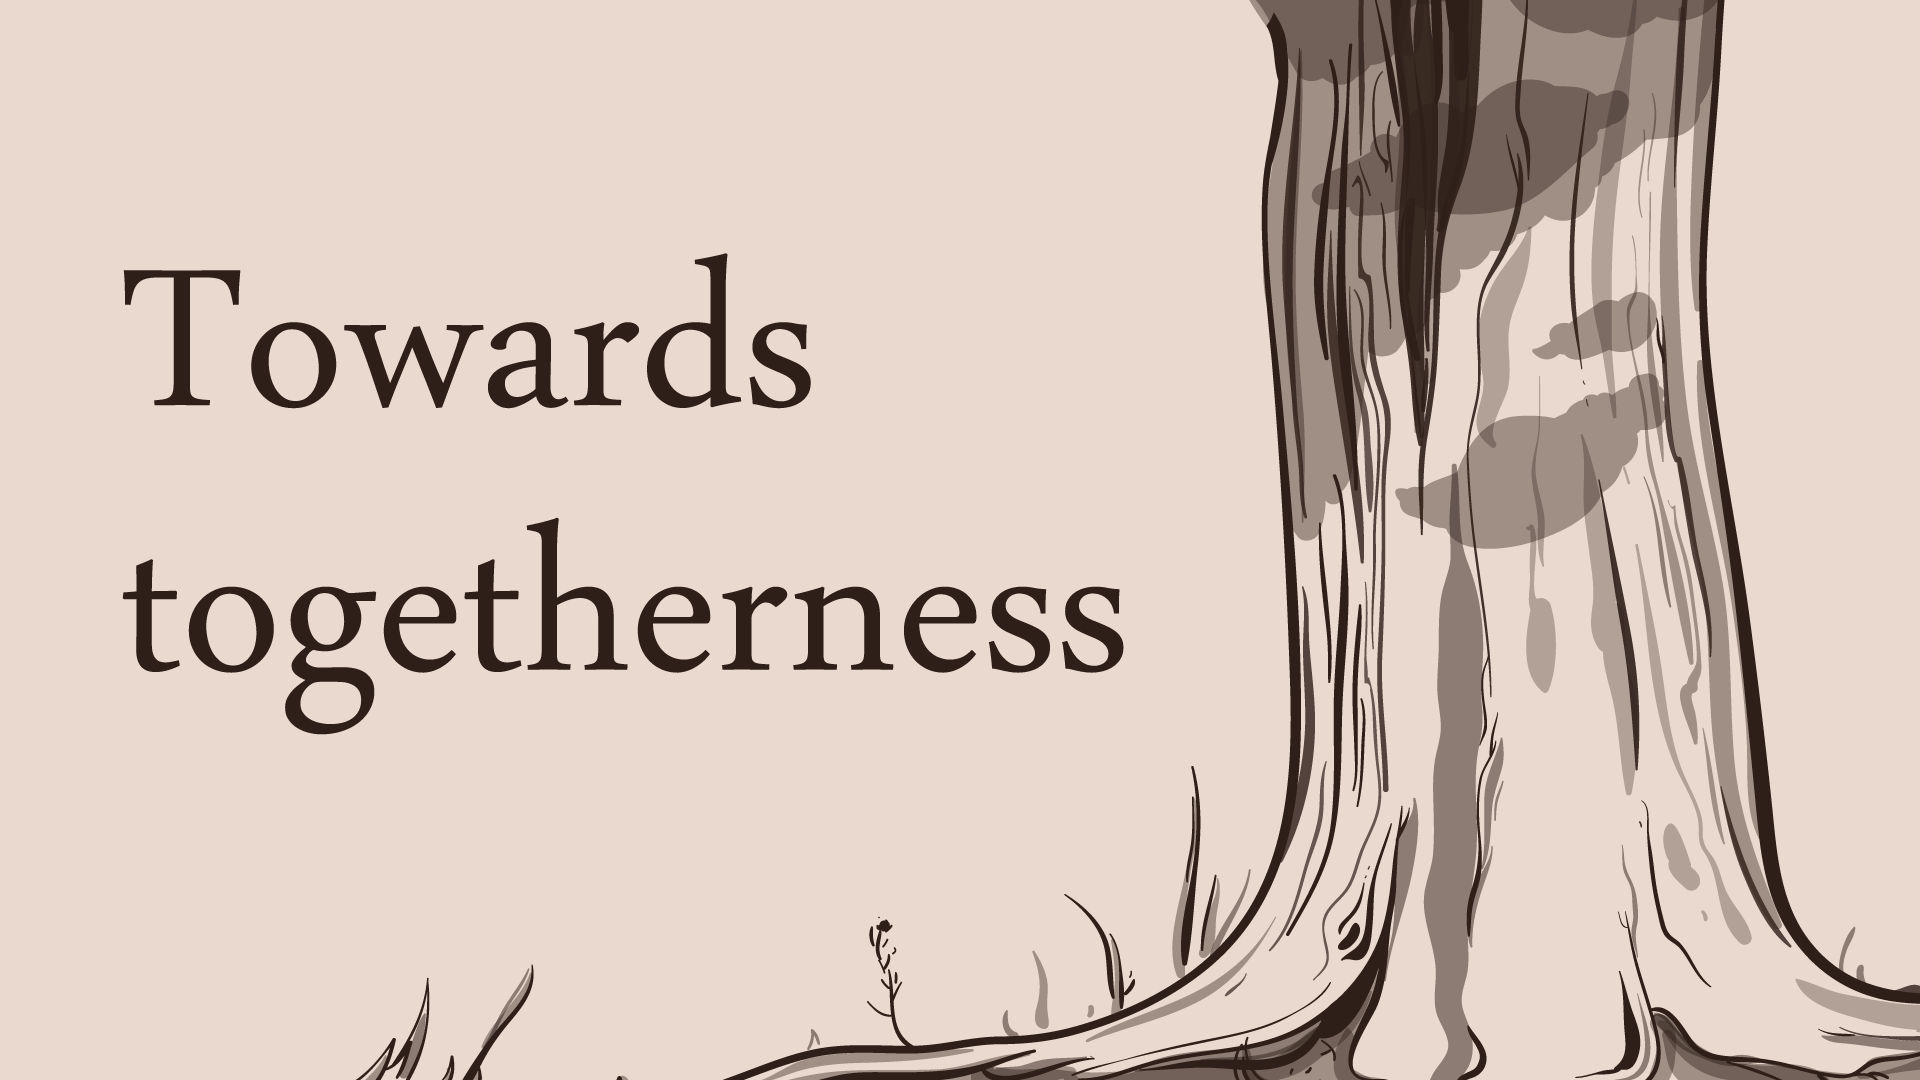 Towards togetherness